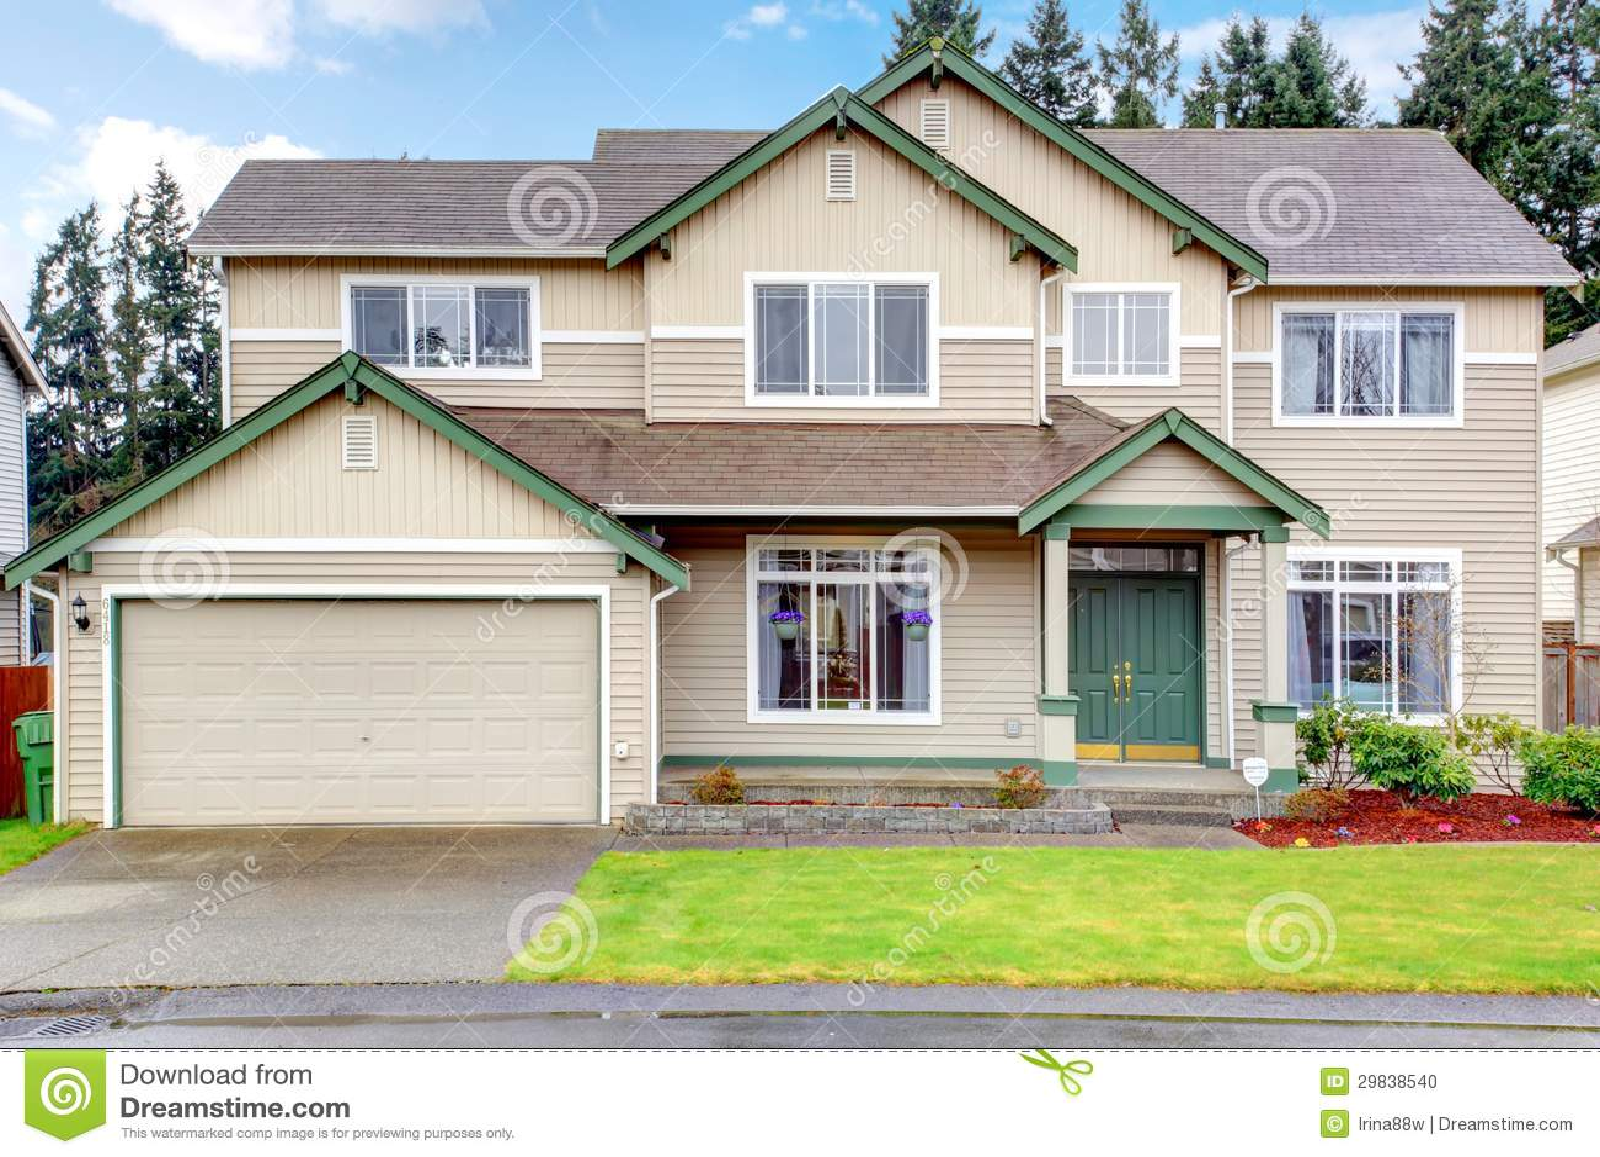 Grande exterior americano noroeste novo clássico da casa.